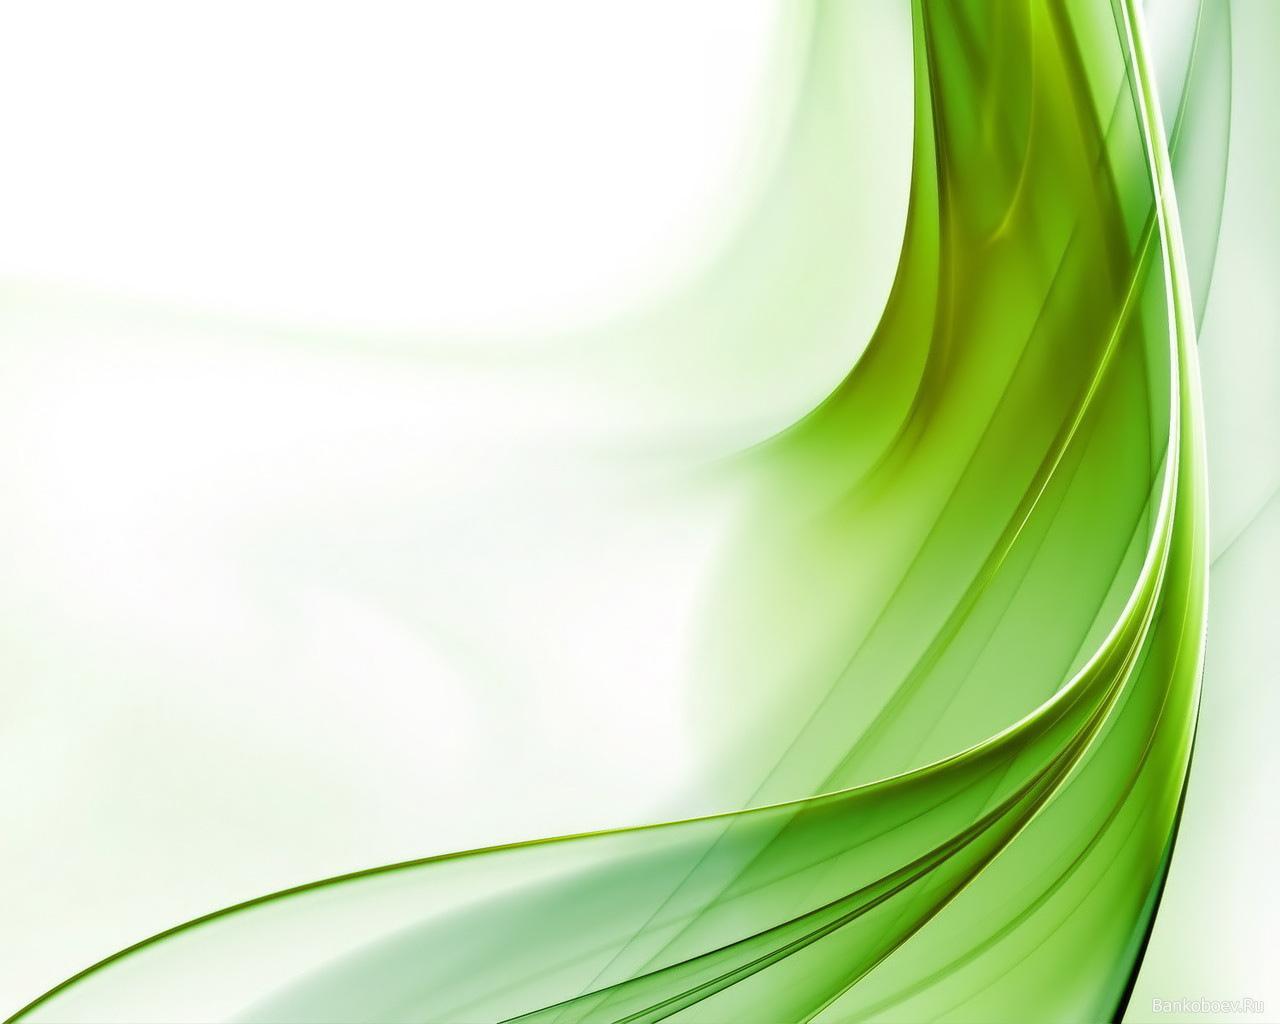 Graphic Design Wallpaper 7444 Hd Wallpapers in Vector n Designs 1280x1024